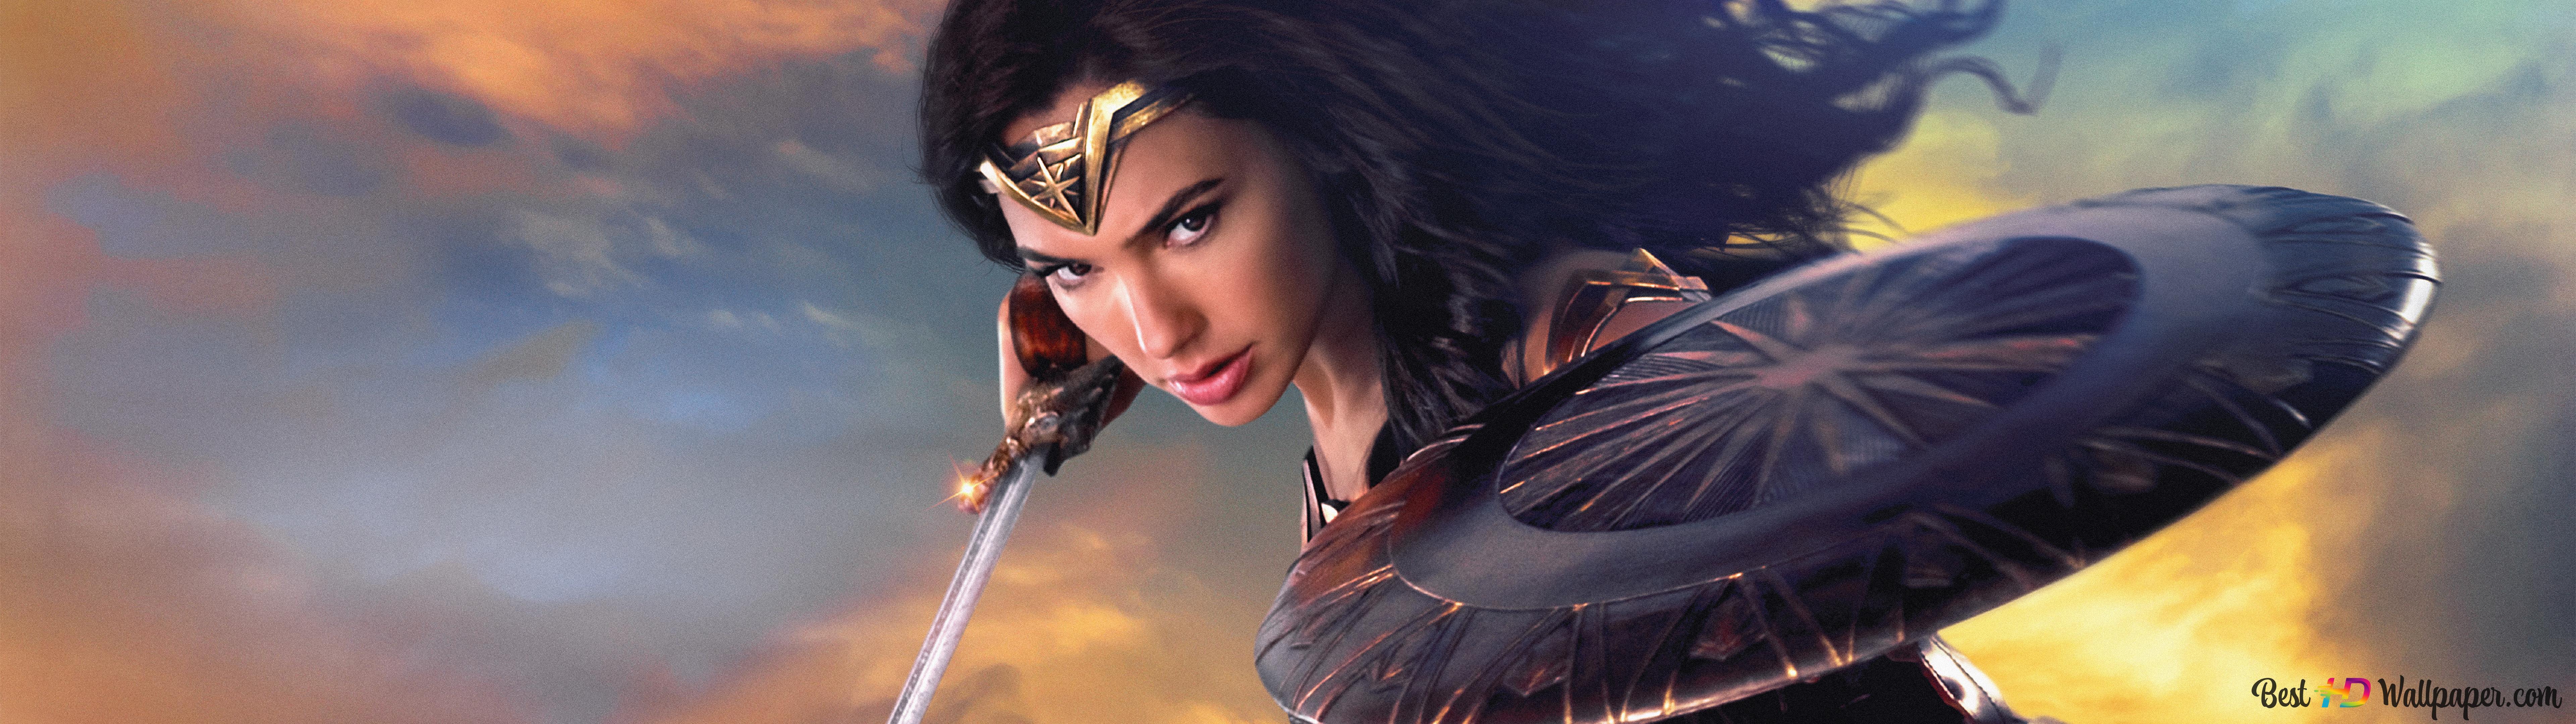 The Most Beautiful Wonder Woman Hd Wallpaper Download